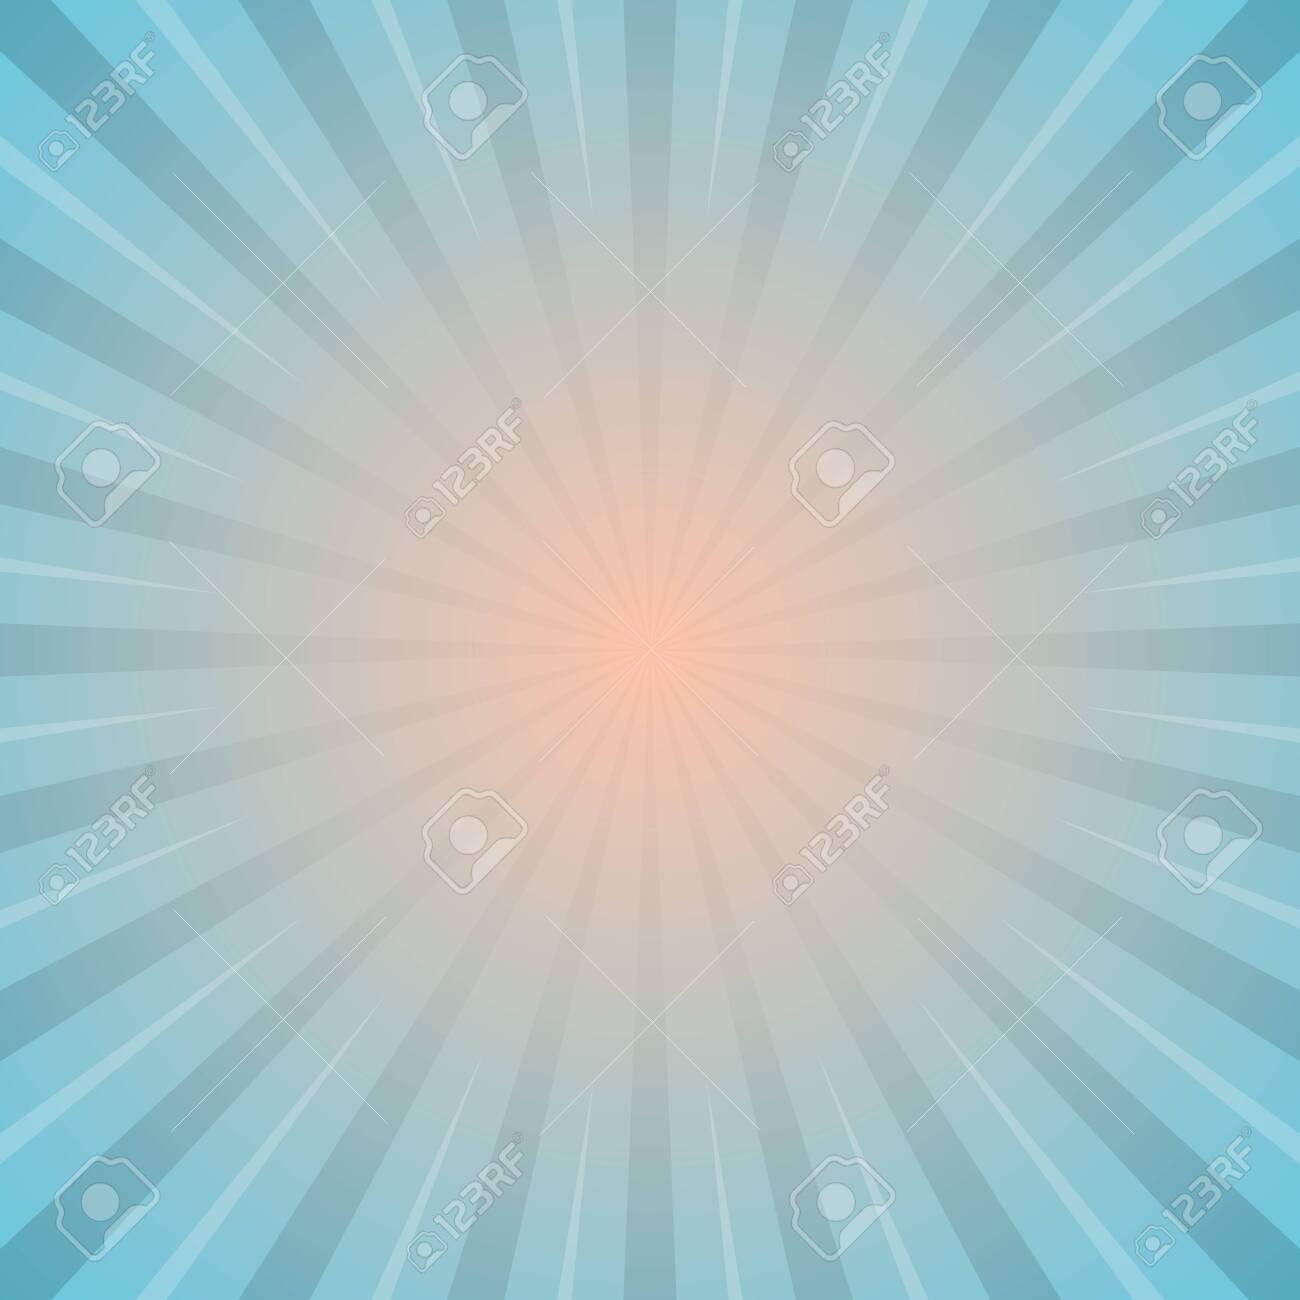 sun with rays star burst television vintage background stock vector illustration - 148238048